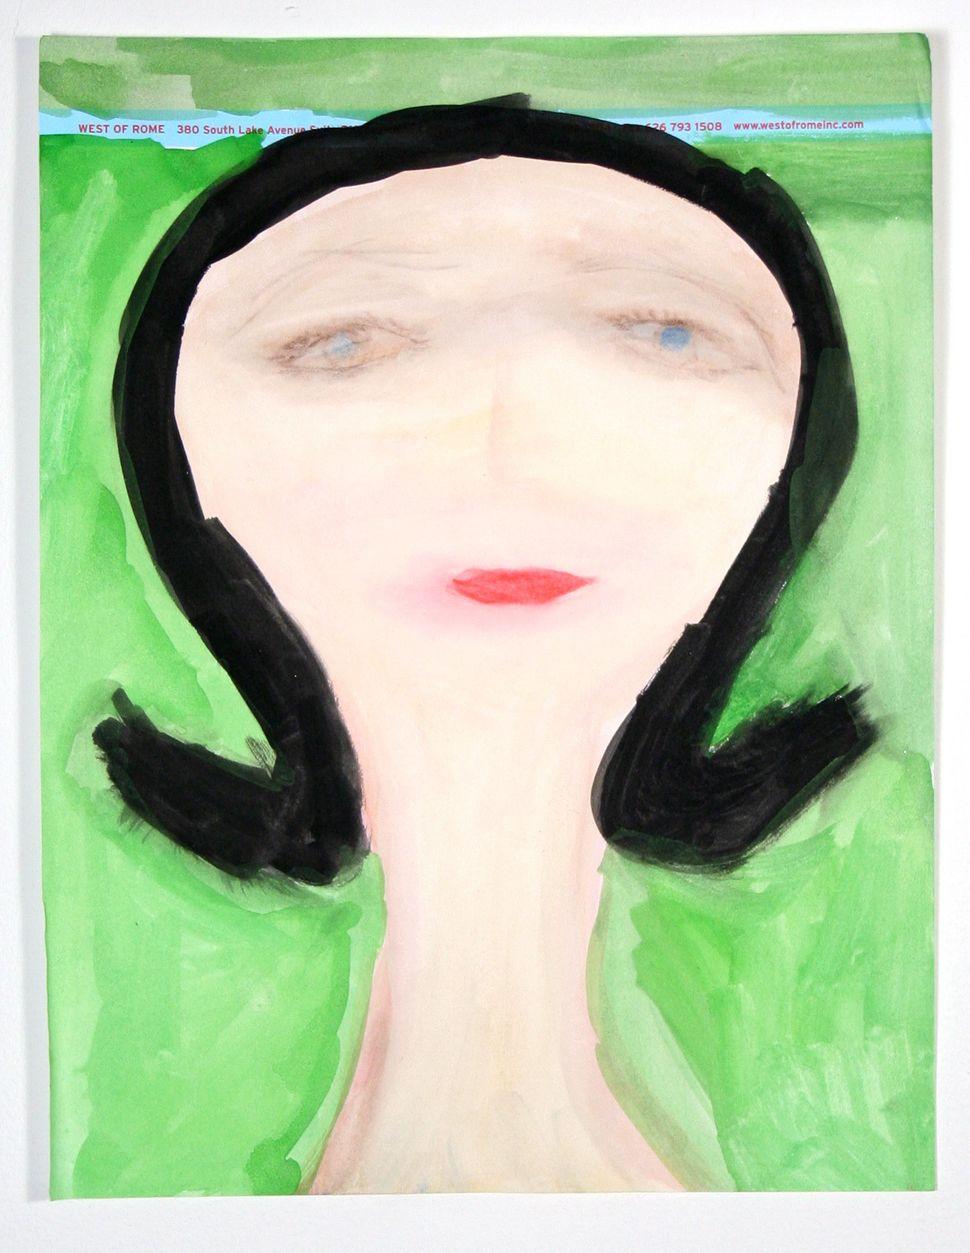 Vaginal Davis, Untitled (Hag), 2012, glycerin, tempera, watercolor, pencil, food coloring, makeup on letterhead